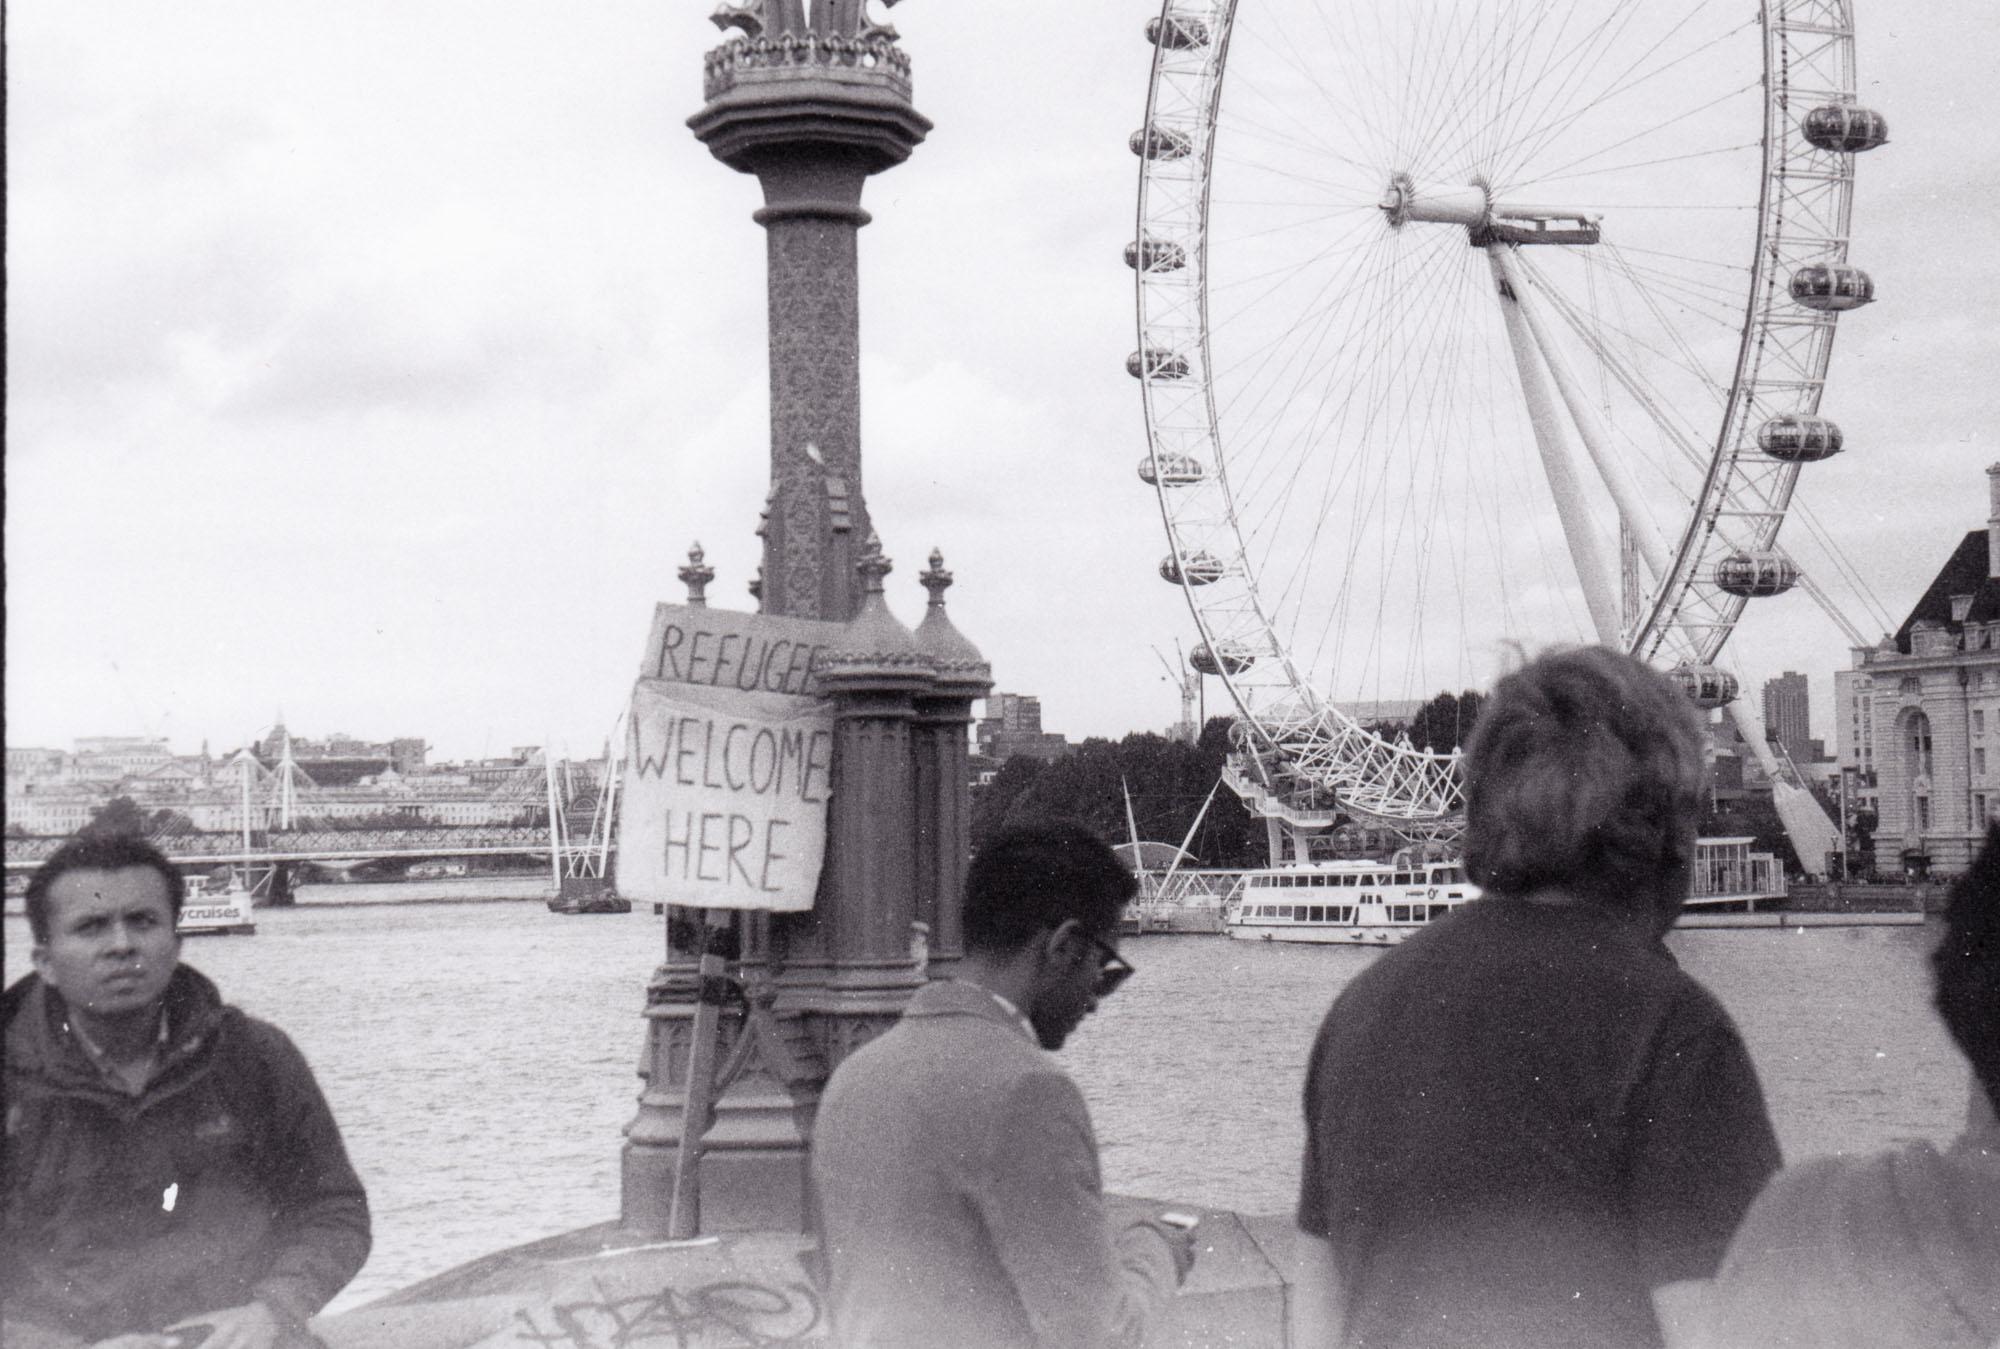 London on Svema 35mm film